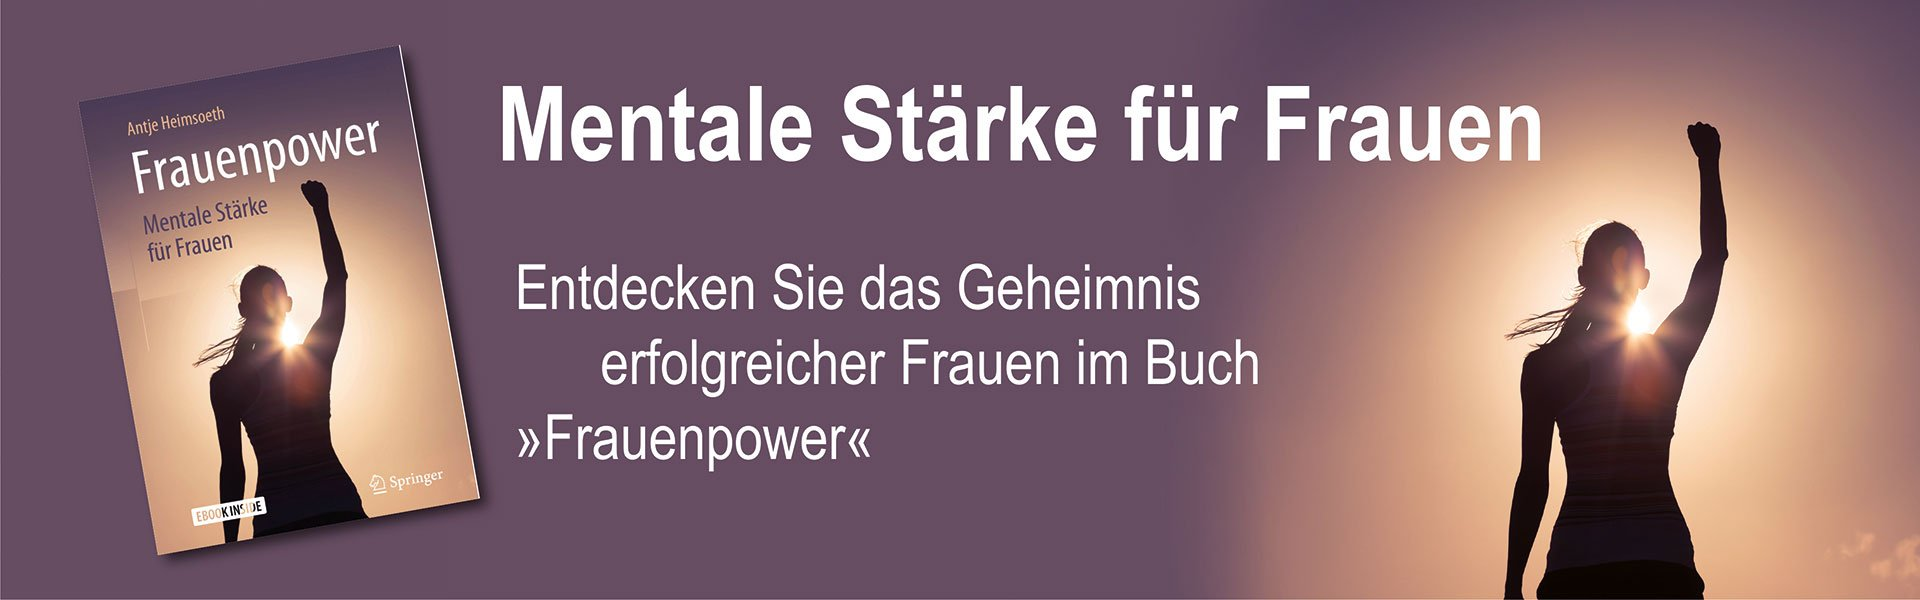 Frauenpower: Mentale Stärke für Frauen, Antje Heimsoeth